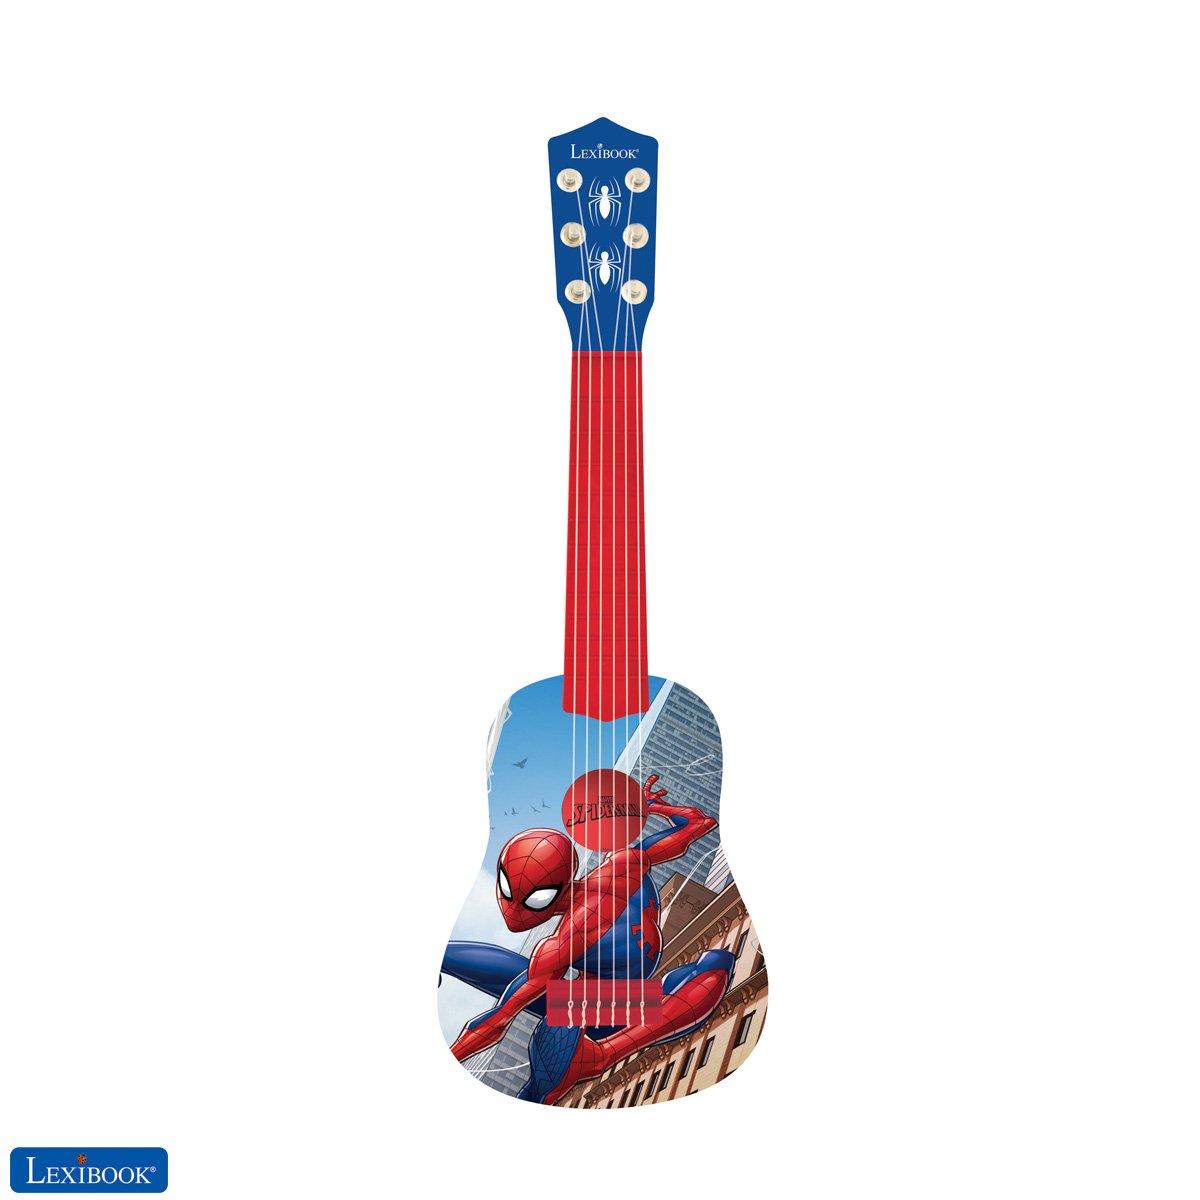 "Lexibook - My first Guitar Spider-Man - 21"" (K200SP)"